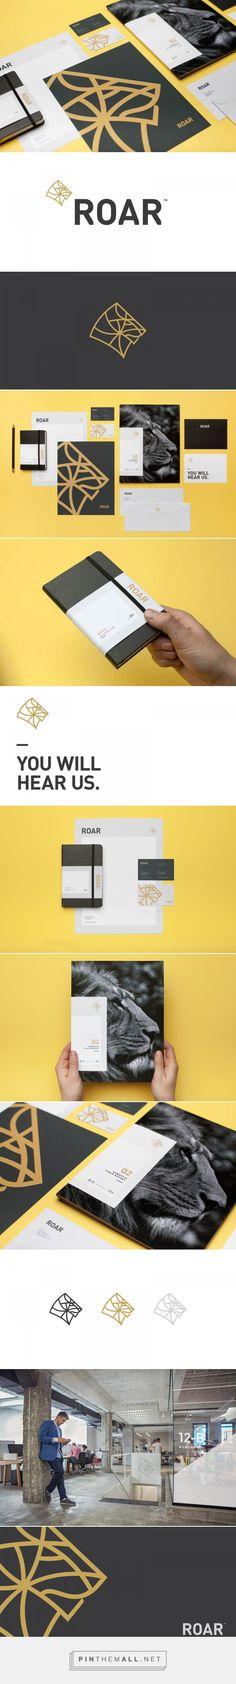 Roar Groupe | Mast - created via https://pinthemall.net